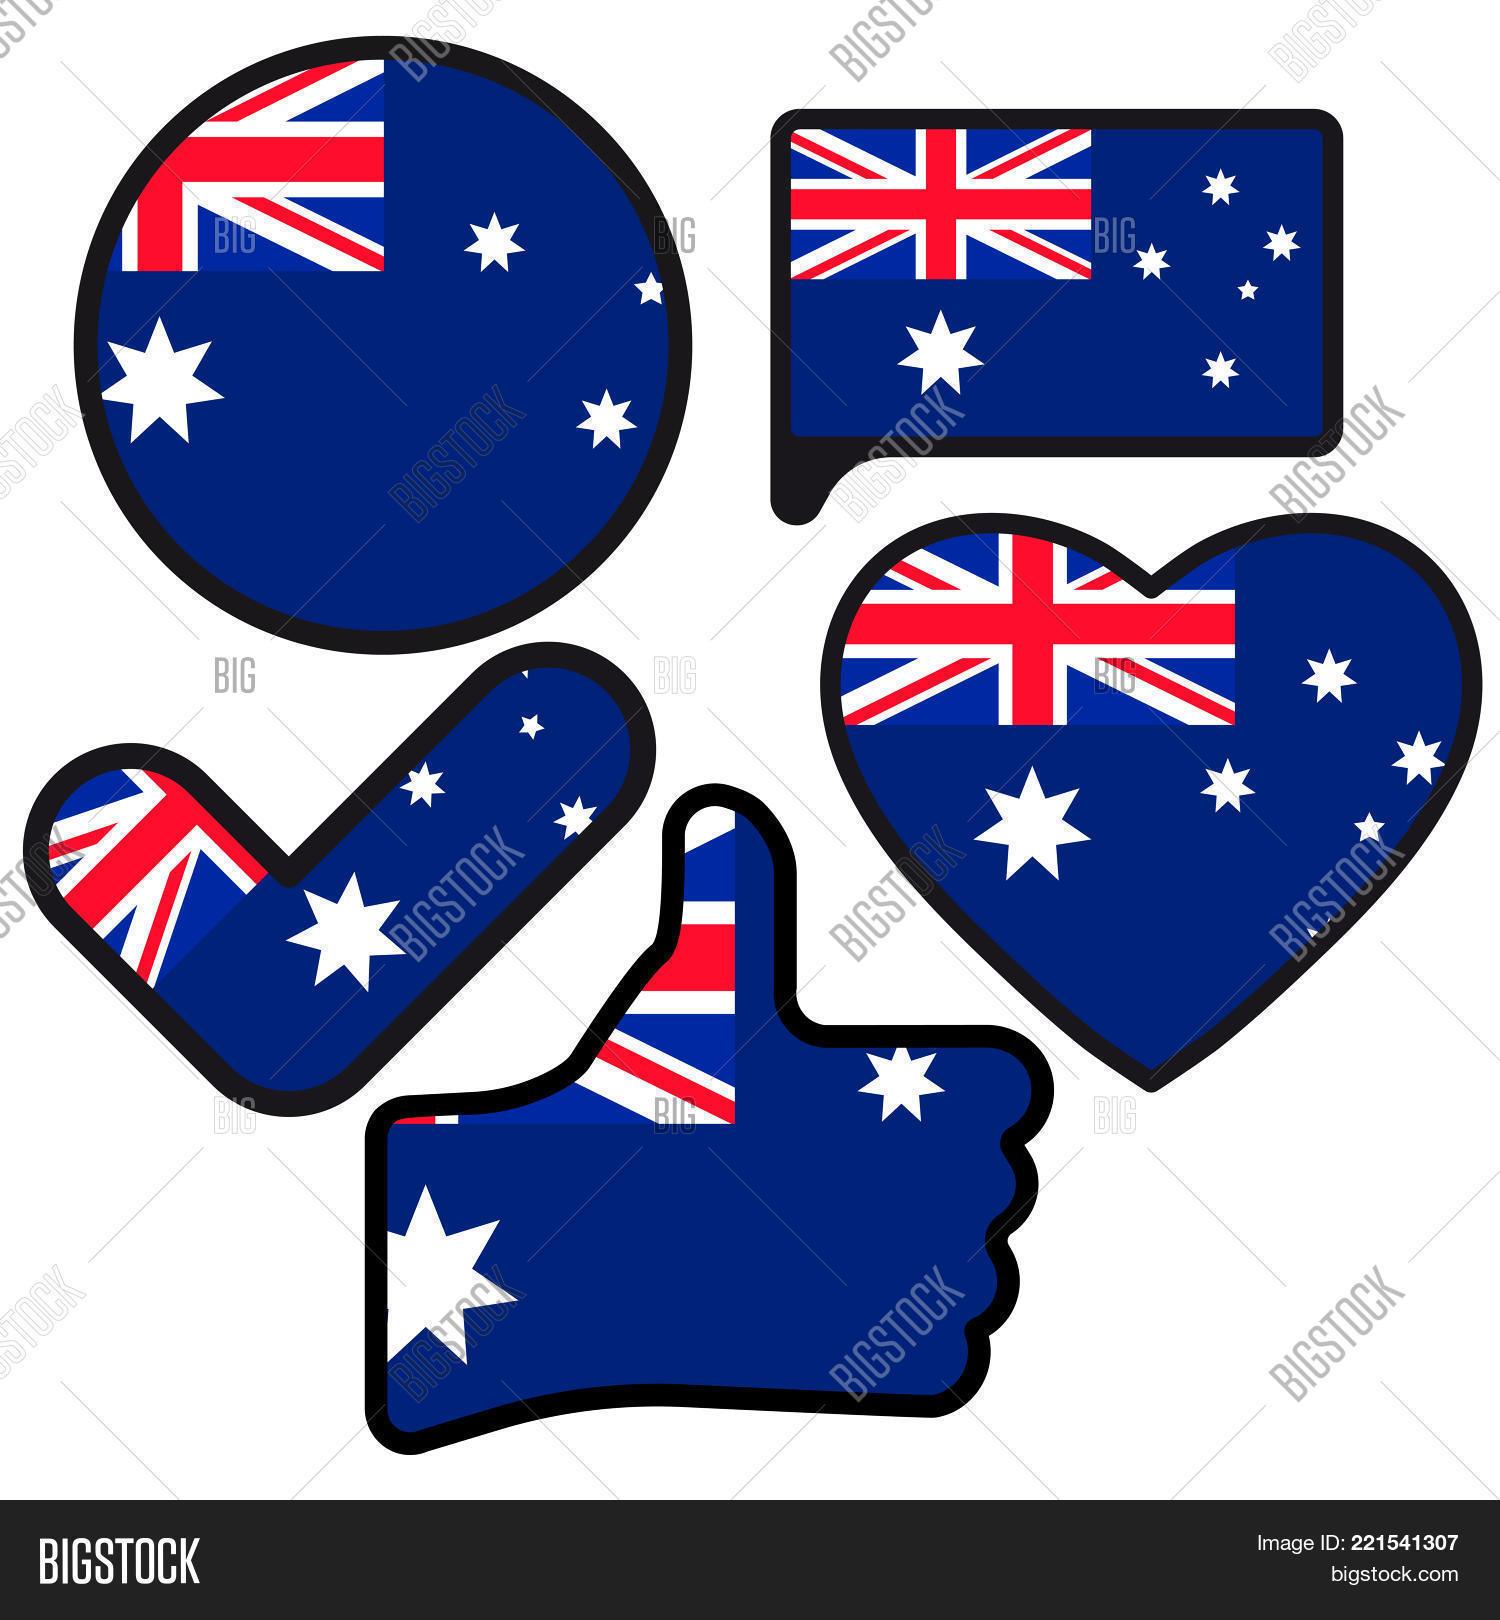 Flag Australia Shape Image Photo Free Trial Bigstock